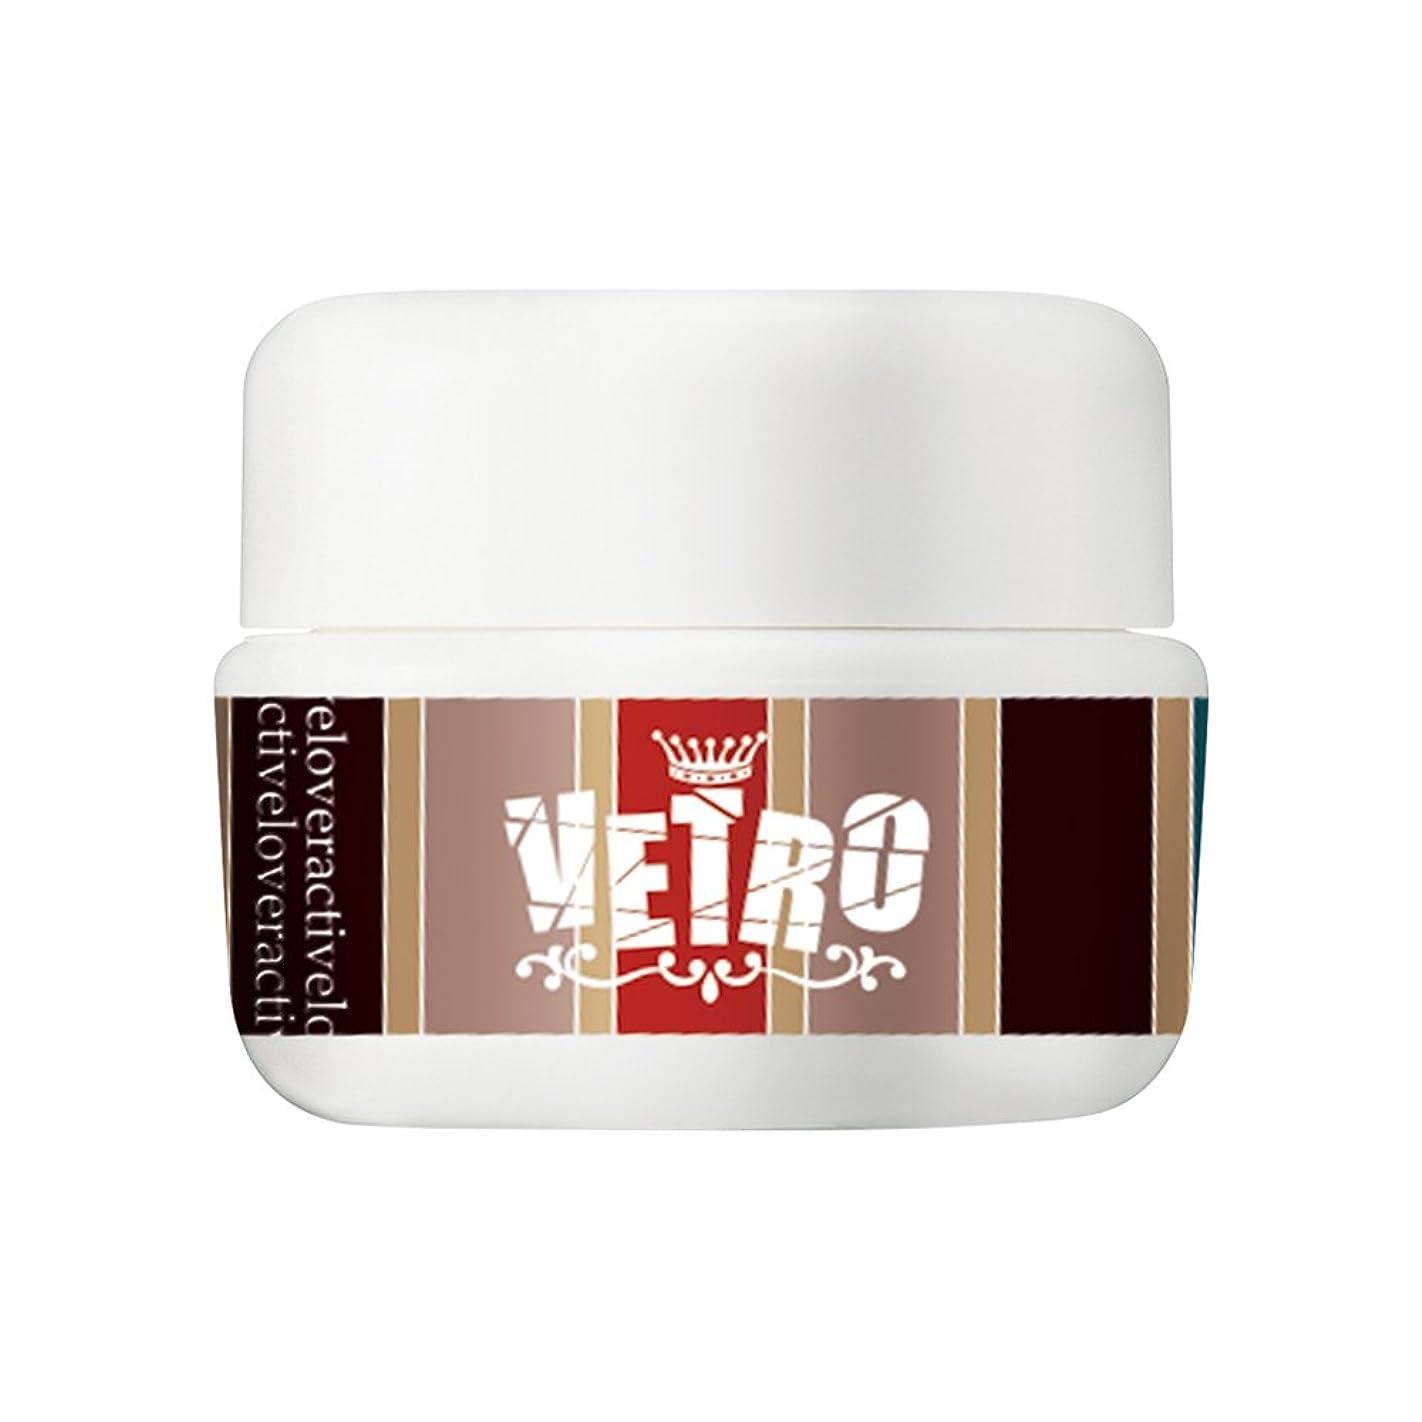 VETRO カラージェル VL388 ネイティブブラウン 5ml UV/LED対応